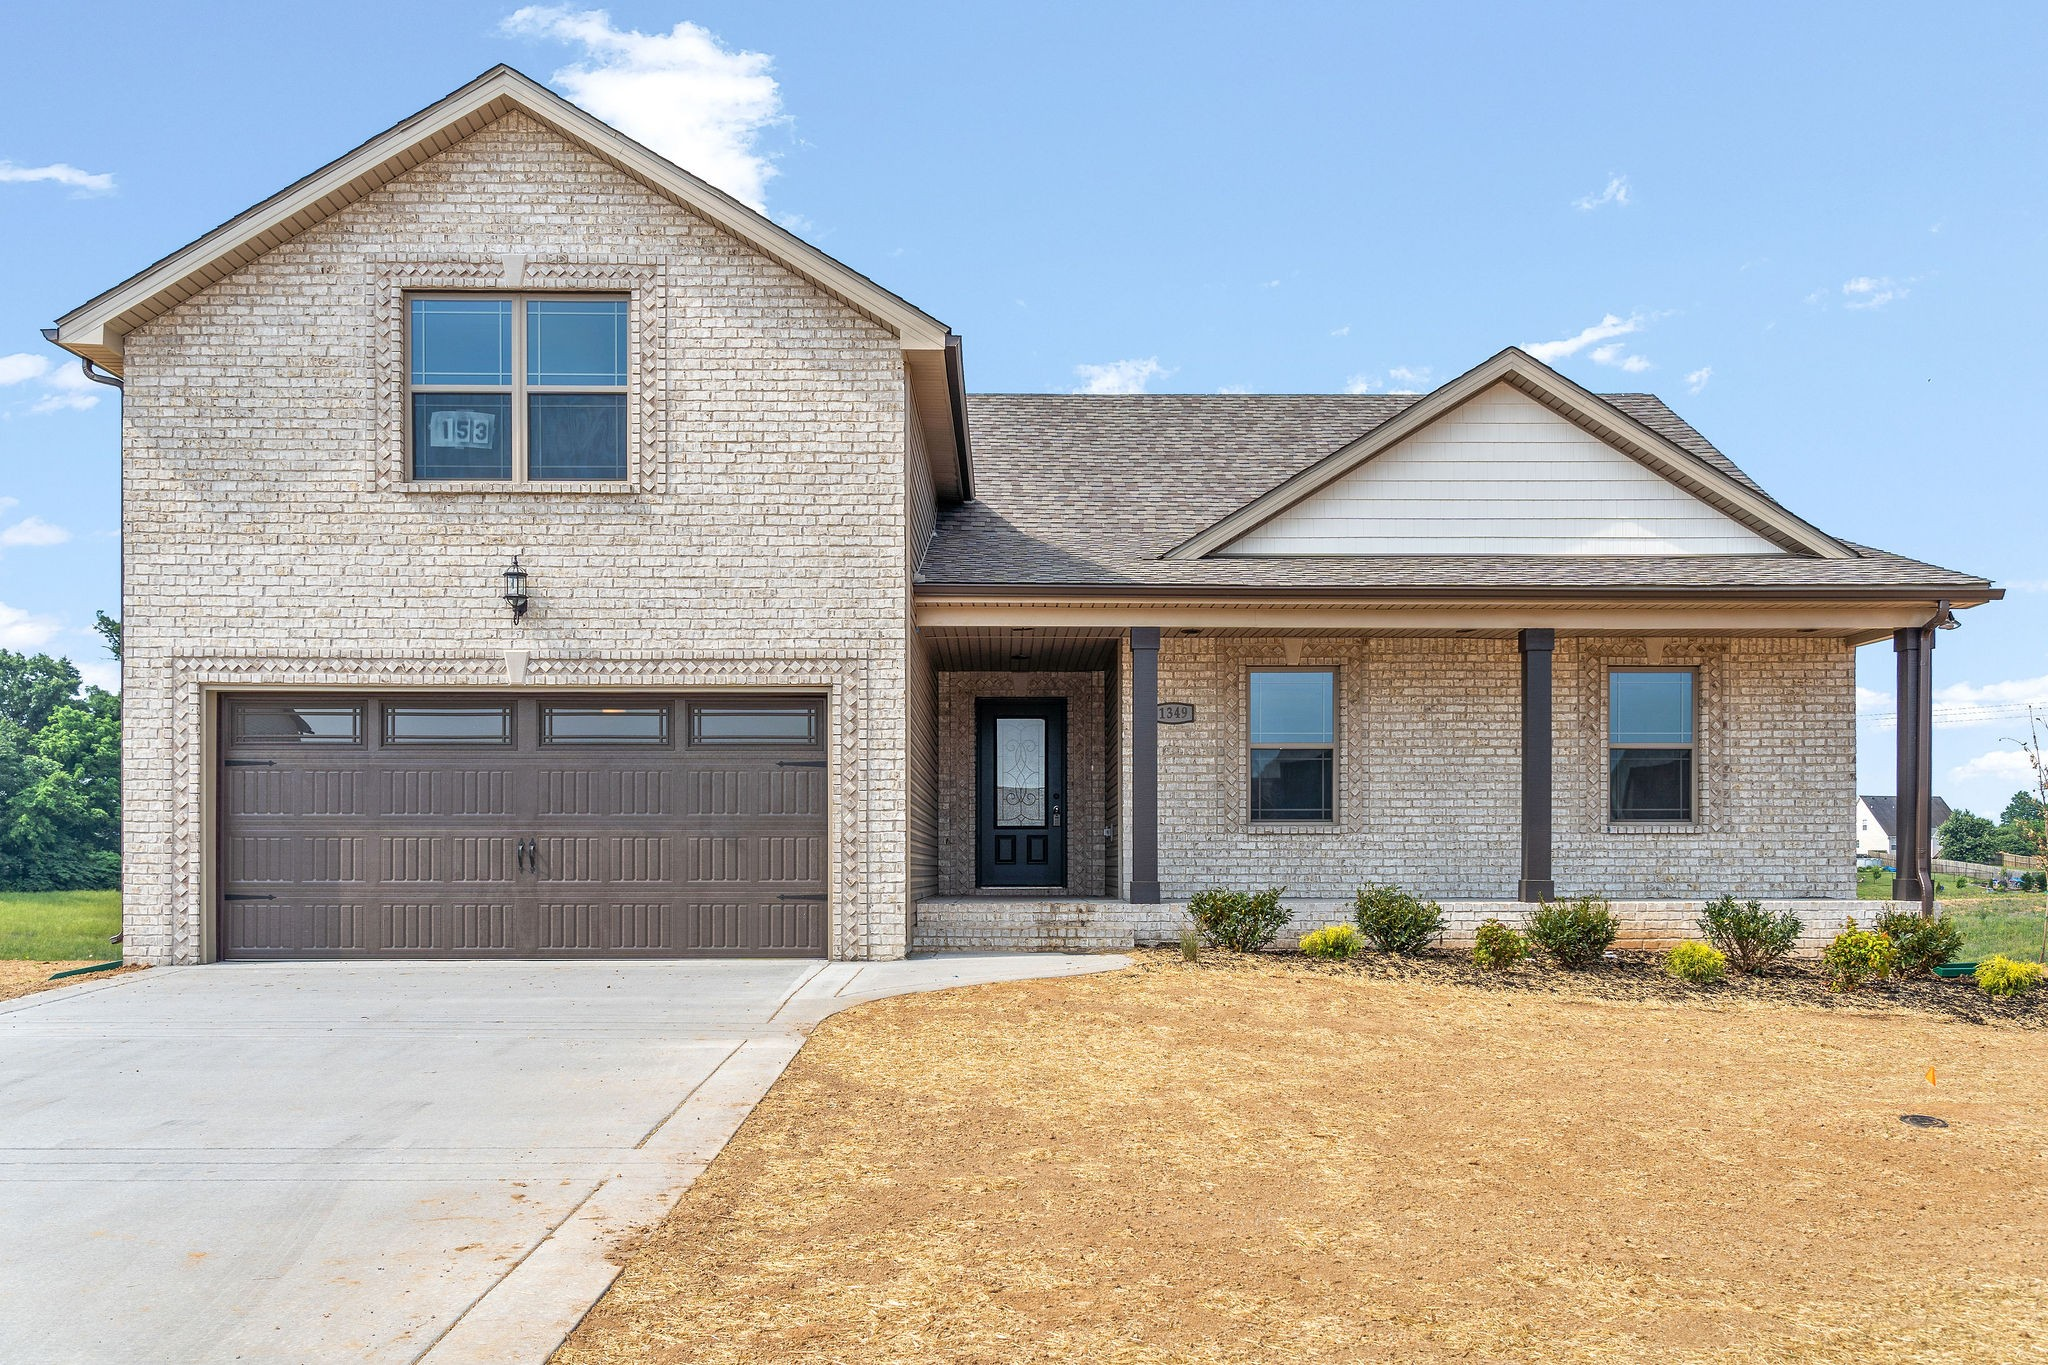 153 Autumnwood Property Photo - Clarksville, TN real estate listing